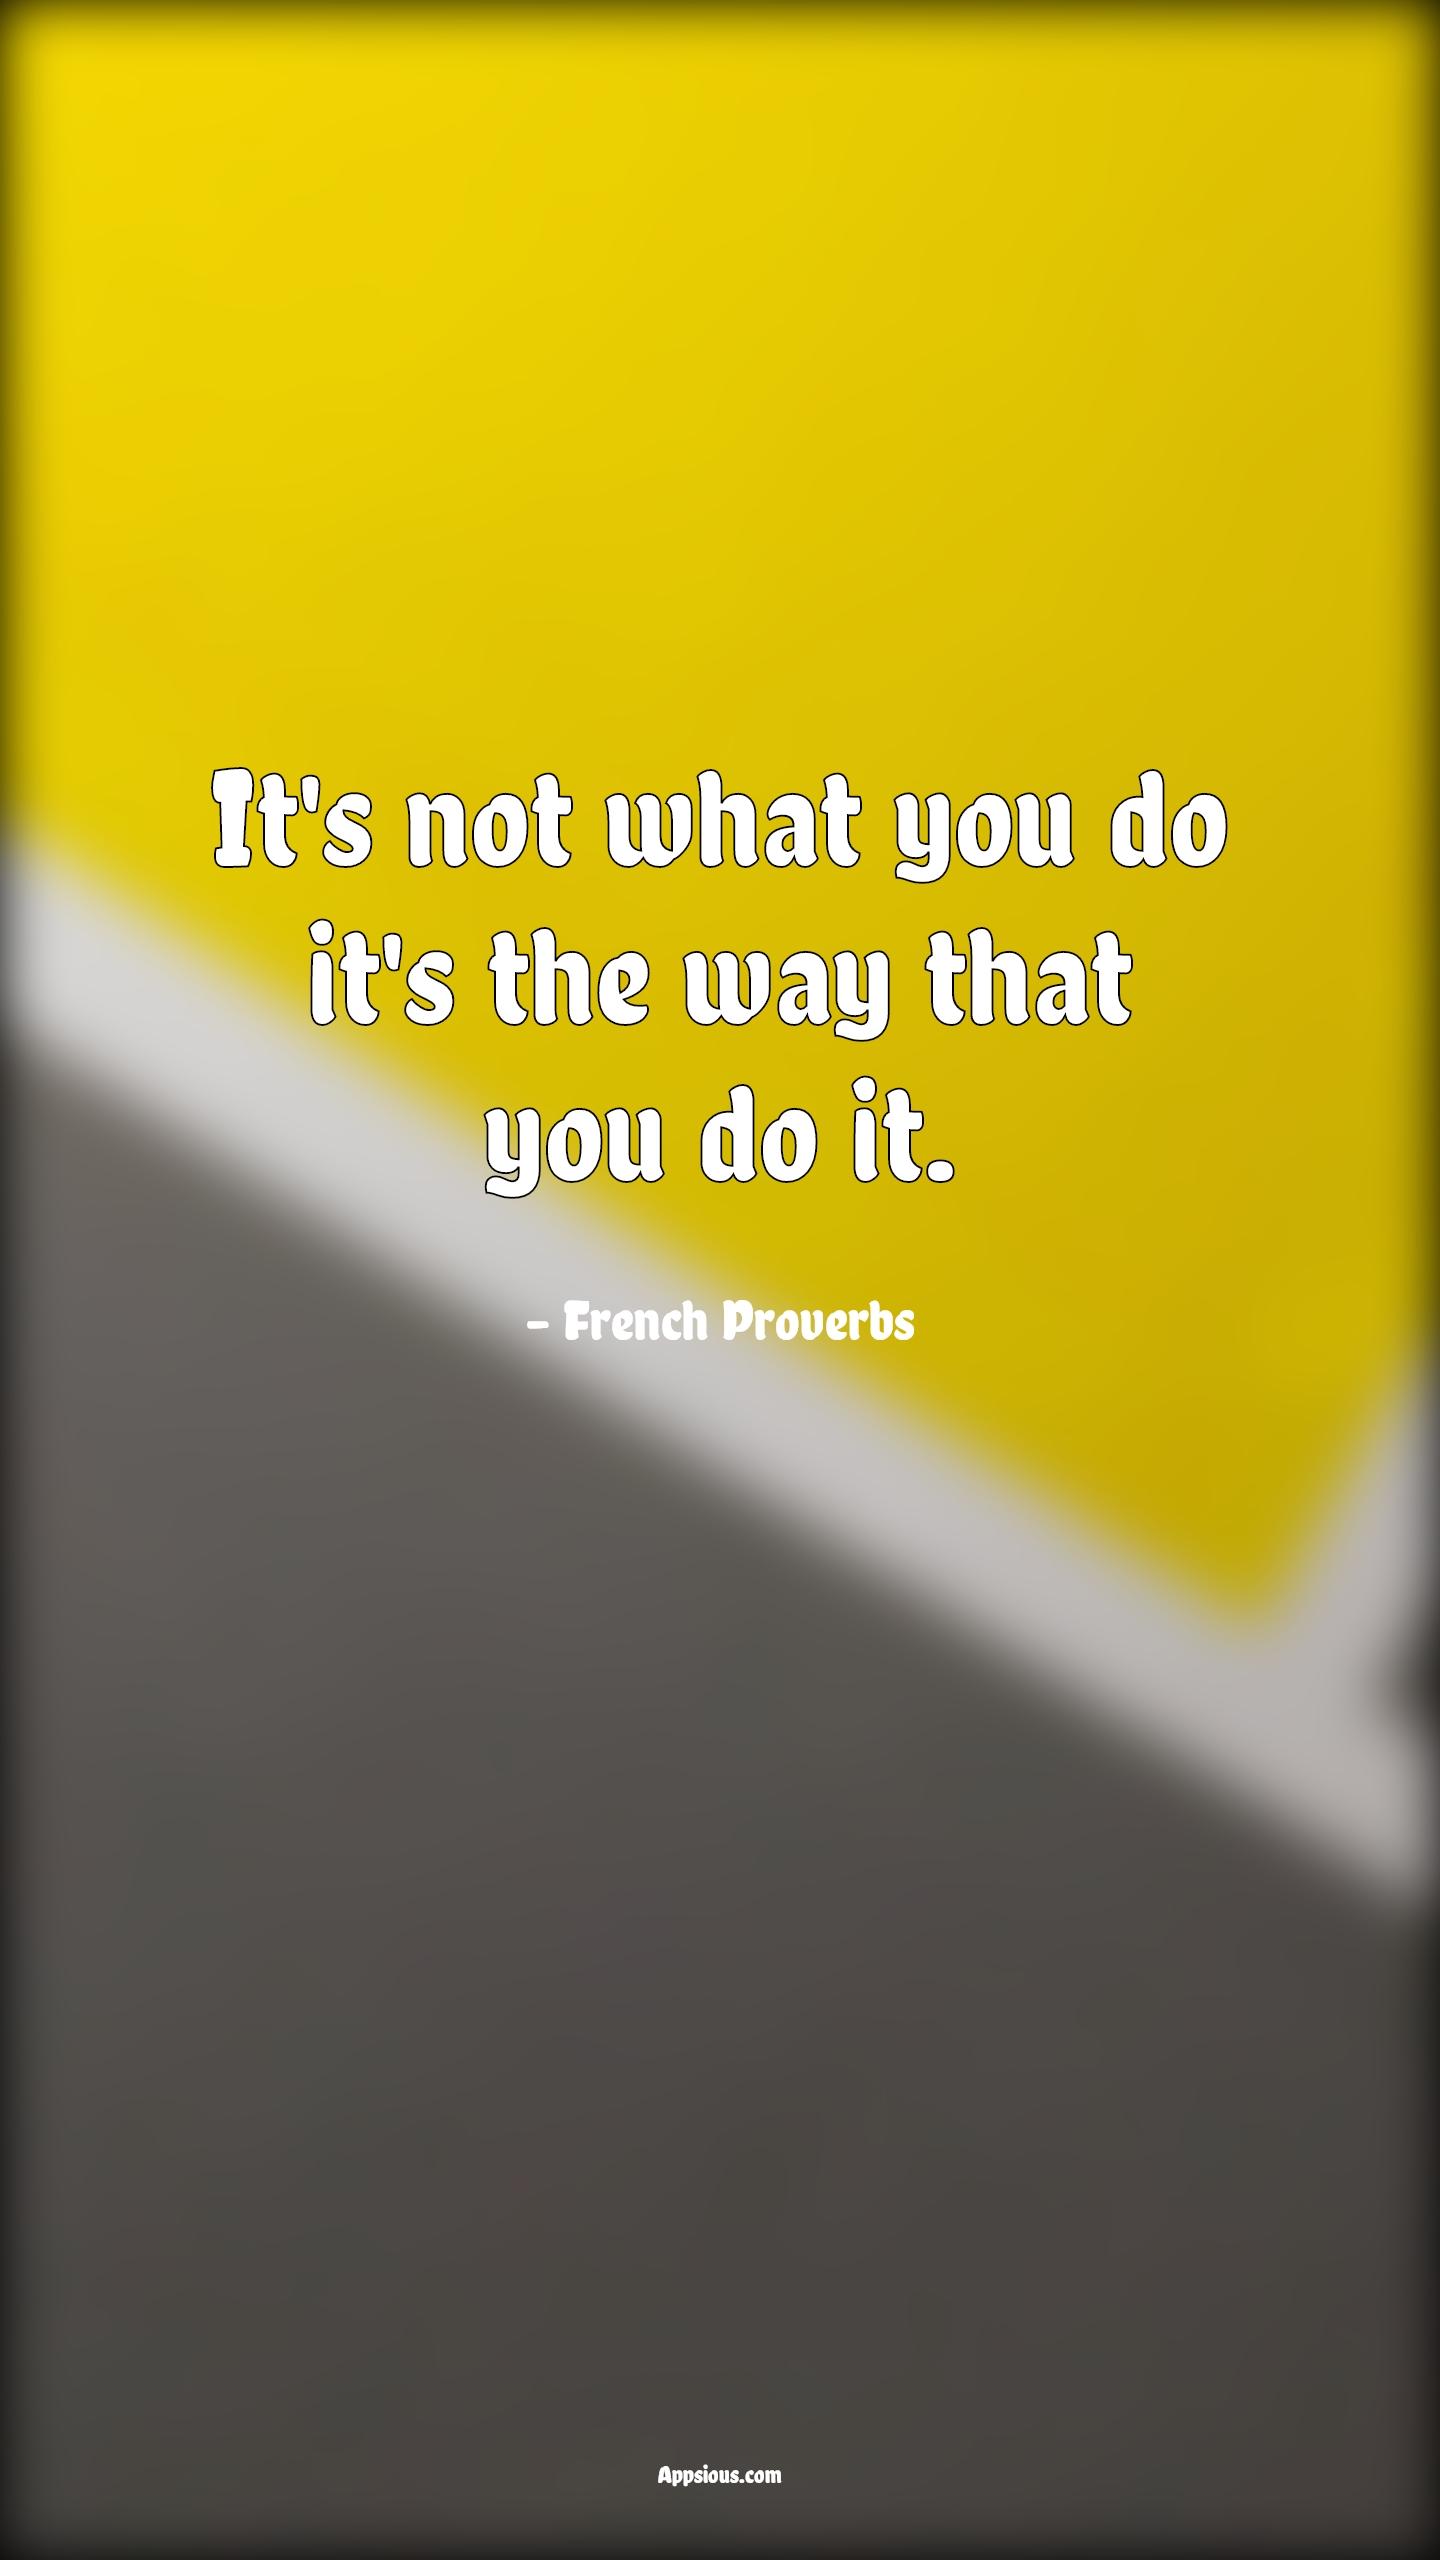 It's not what you do it's the way that you do it.